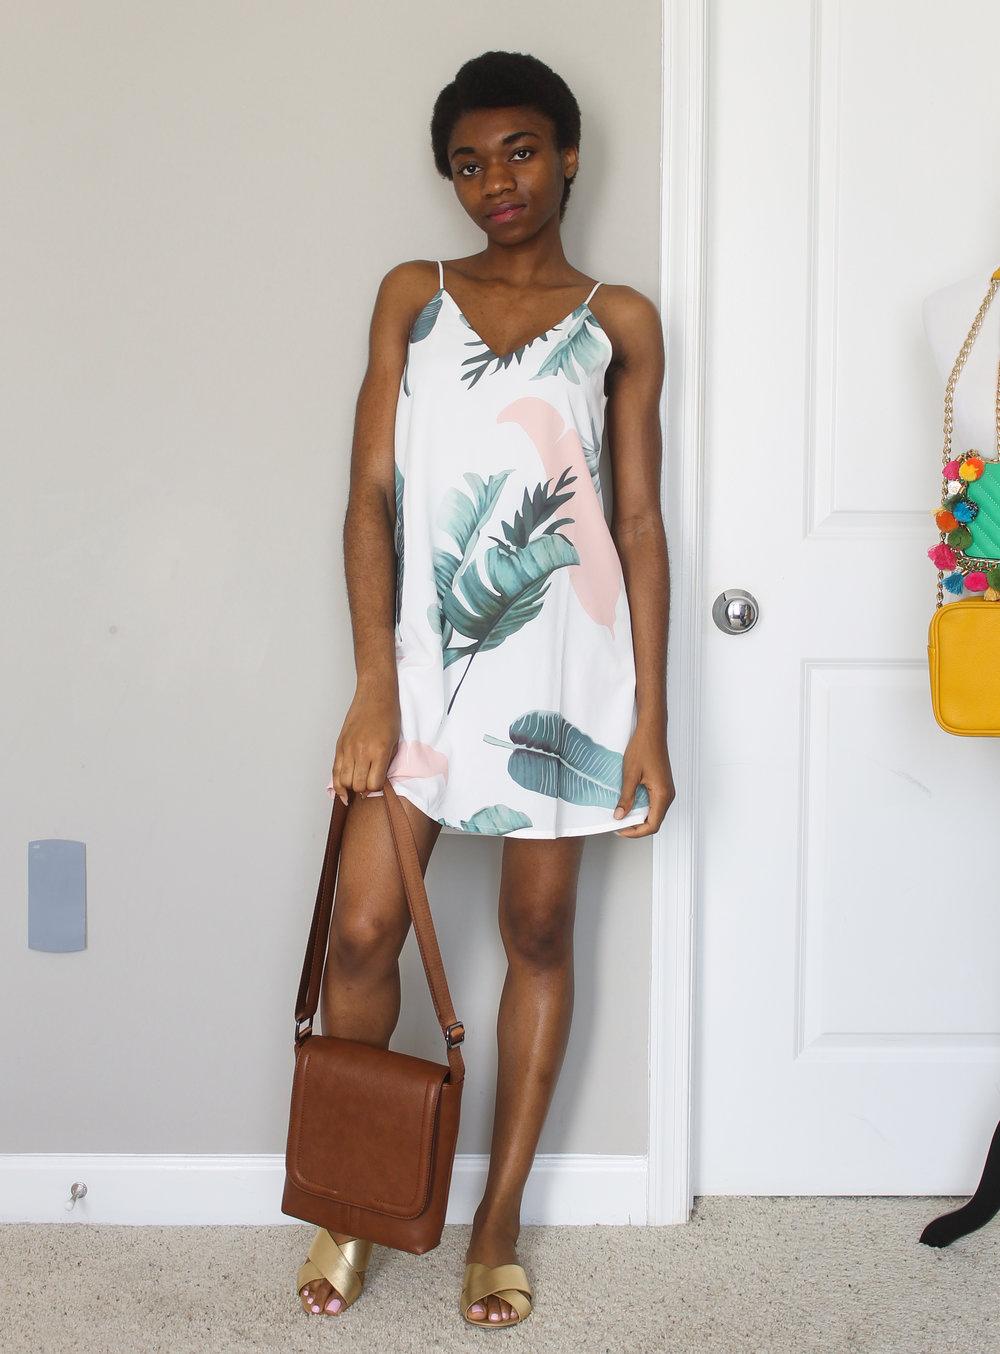 4WaystoWear-tropical-prints-dress 5.jpg